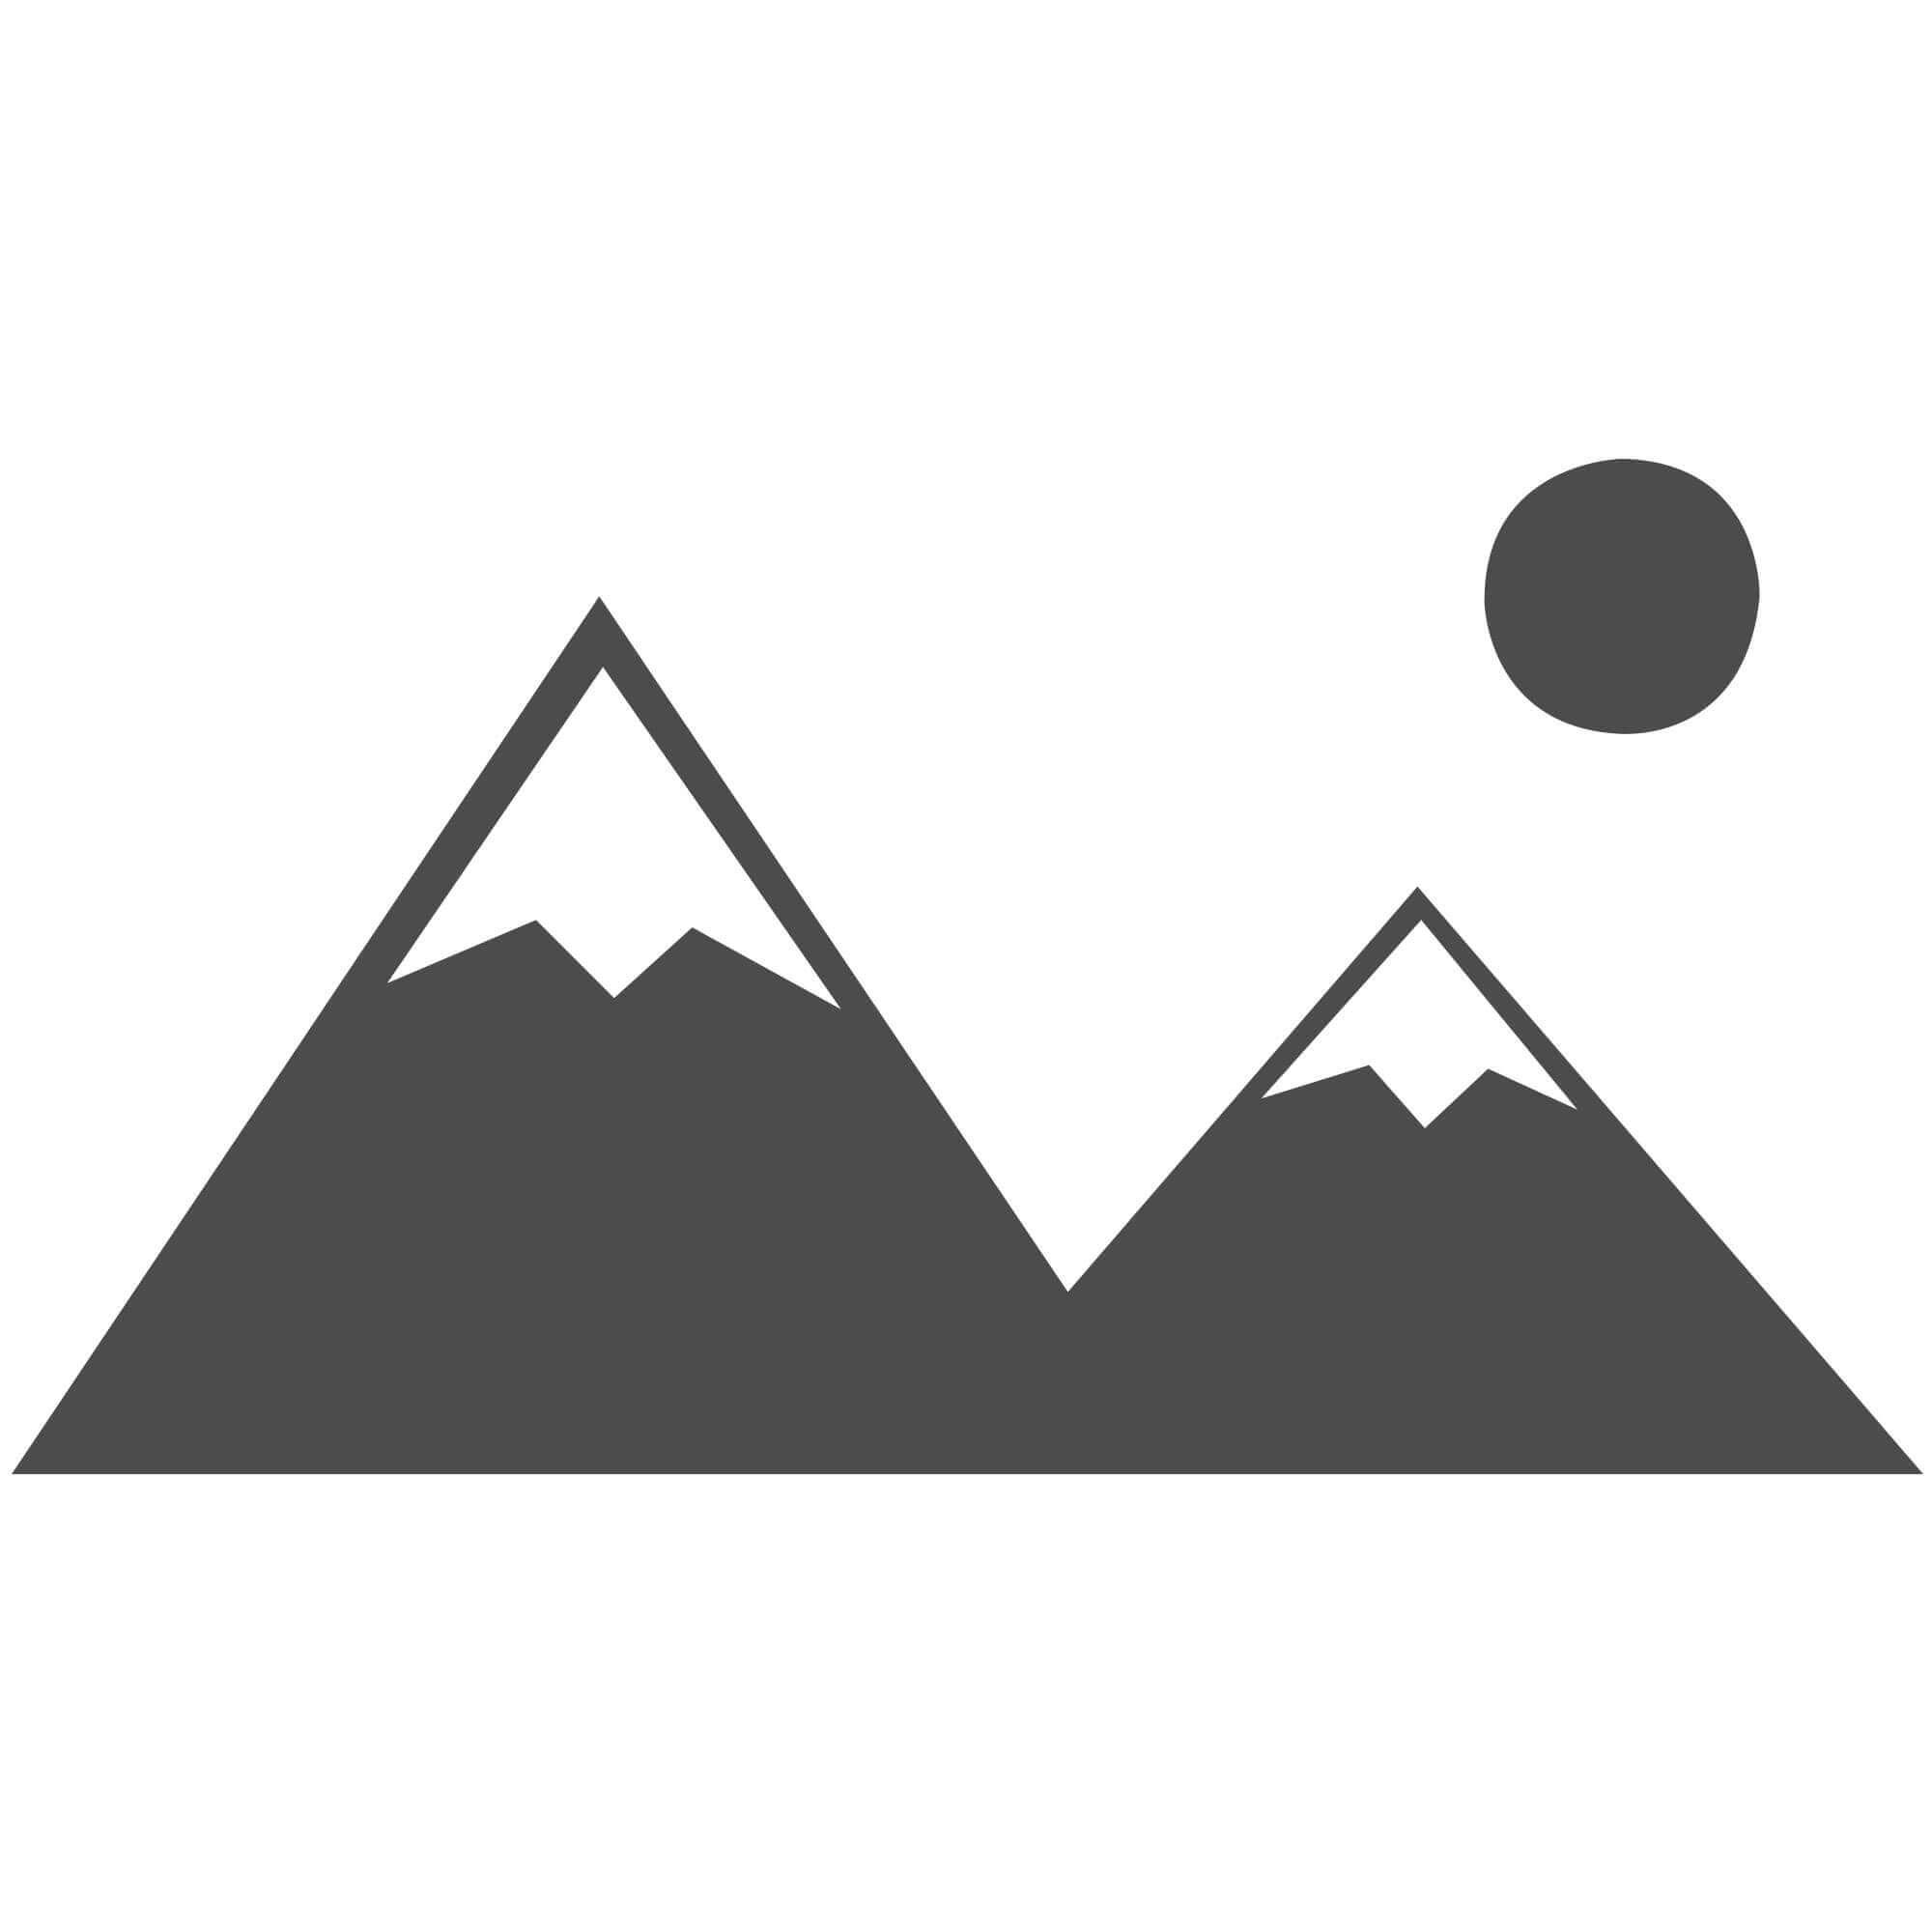 "Whisper Shaggy Rug - Navy Blue - Size 140 x 200 cm (4'7"" x 6'7"")"